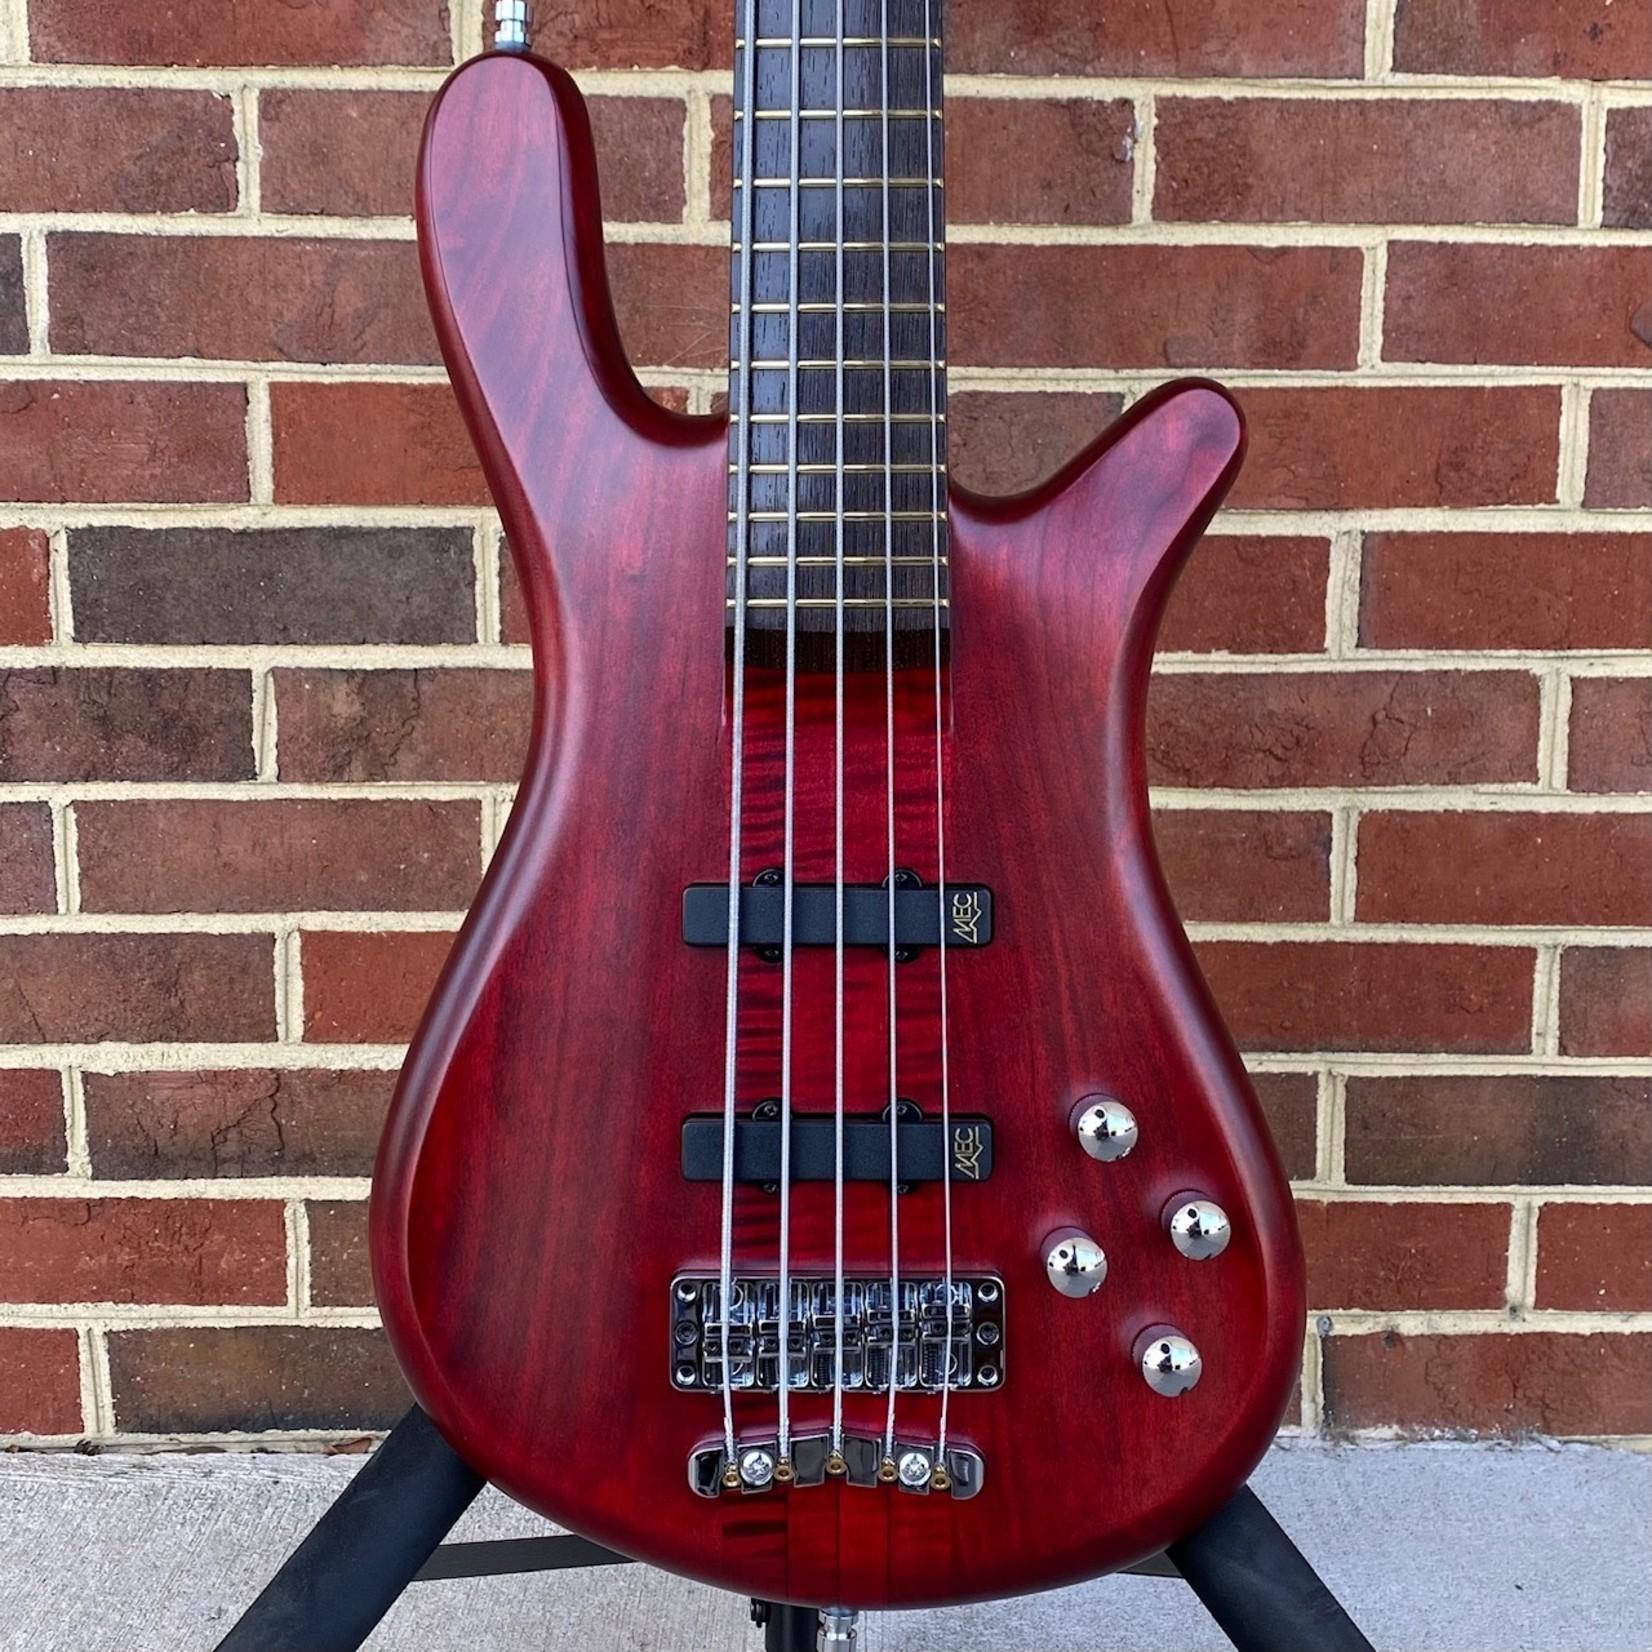 Warwick Warwick Pro Series Streamer Stage 1 5-String, Burgundy Red Transparent Satin, Neck-Thru, Cherry Body, Flamed Maple Neck, Wenge Fretboard, Gig Bag